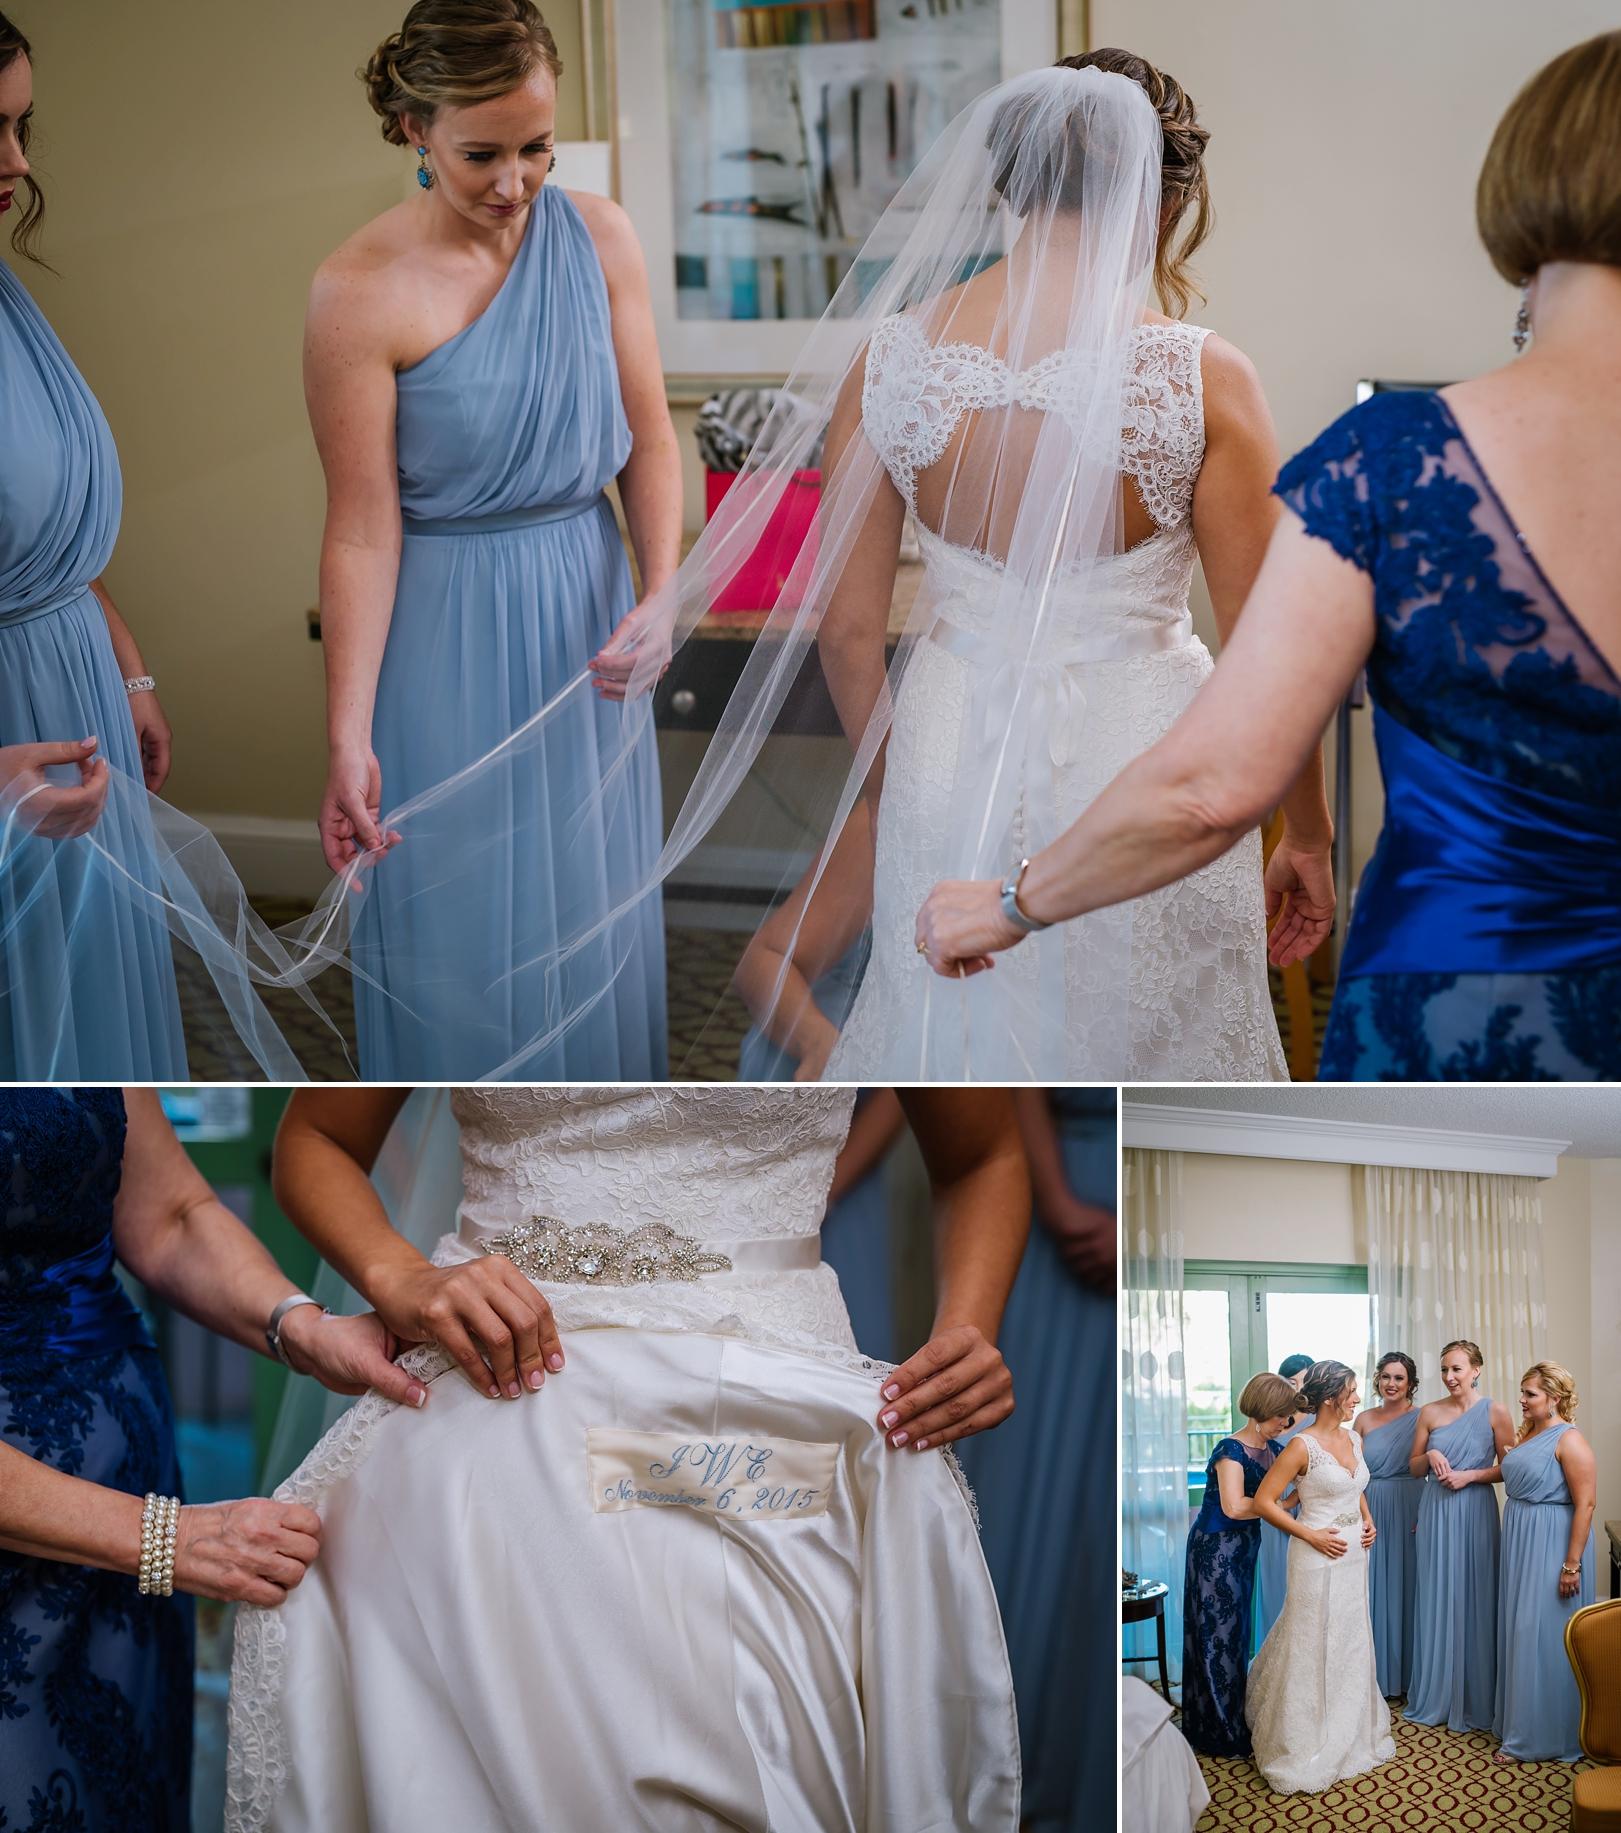 st-pete-art-museum-wedding-vinoy-ashlee-hamon-photography_0003.jpg